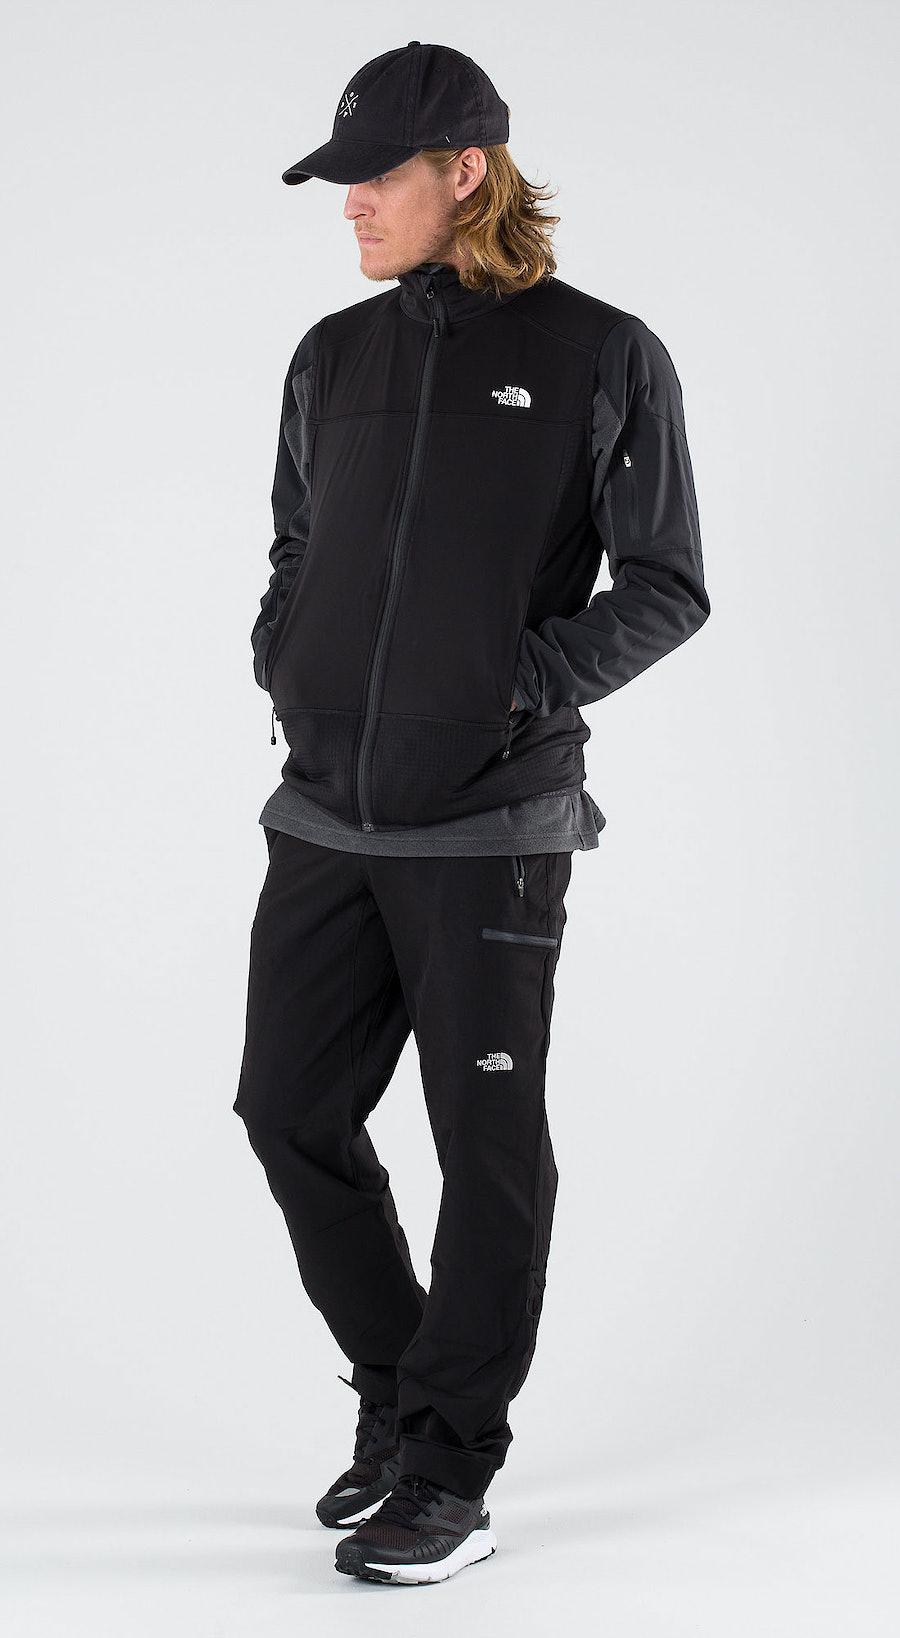 The North Face Hybrid Softshell V Tnf Black/Tnf Black Outfit Multi